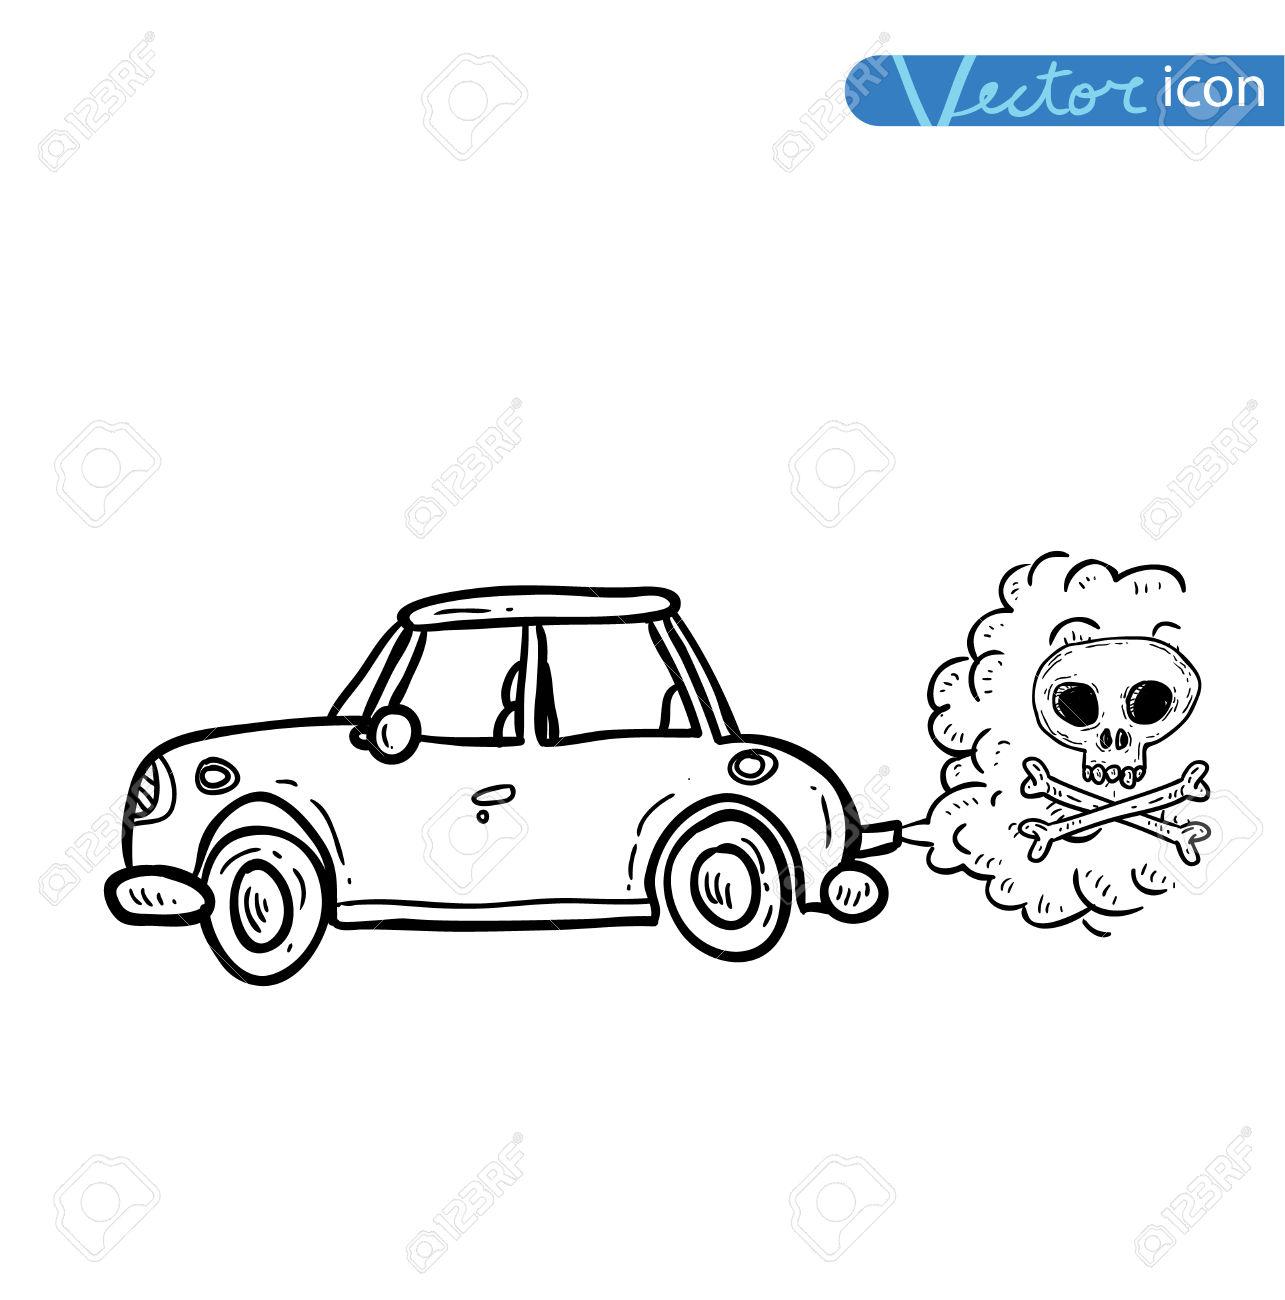 Car smoke car clipart clipart royalty free Car smoke clipart - ClipartFest clipart royalty free